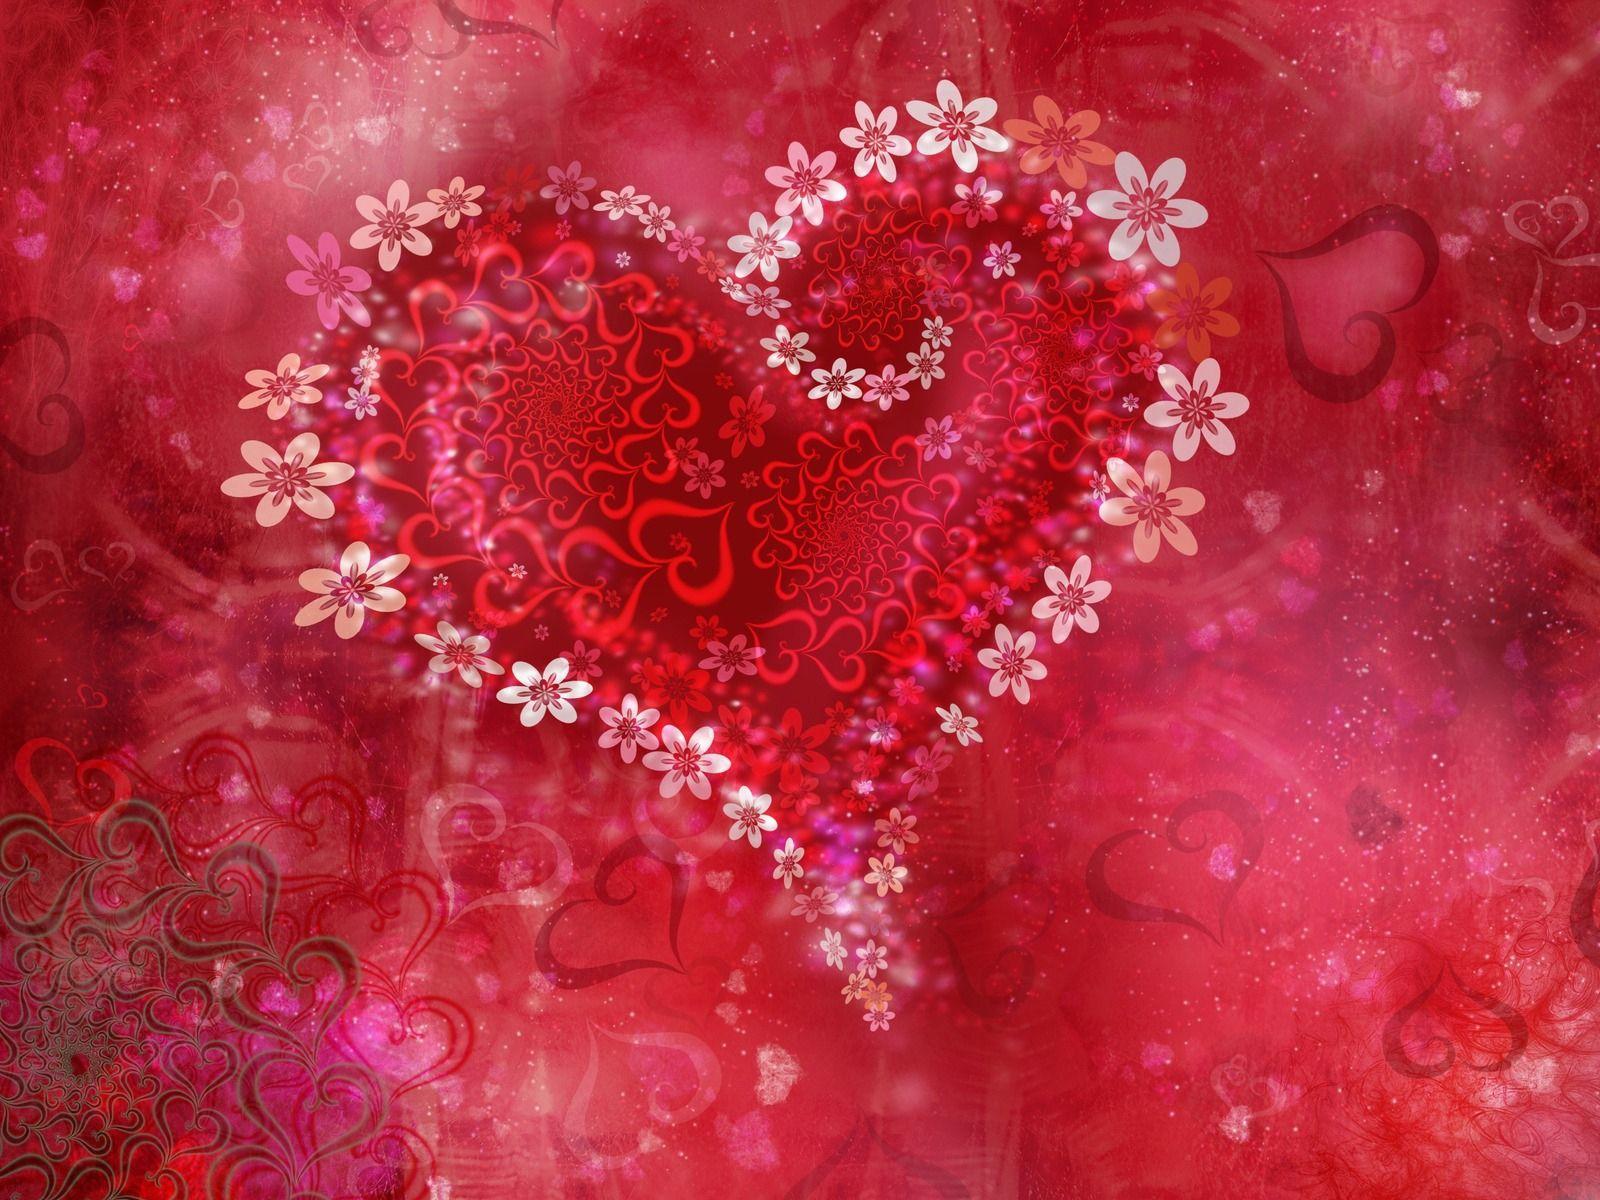 Heart Wallpaper Free Download Hearts Pinterest Wallpaper Free